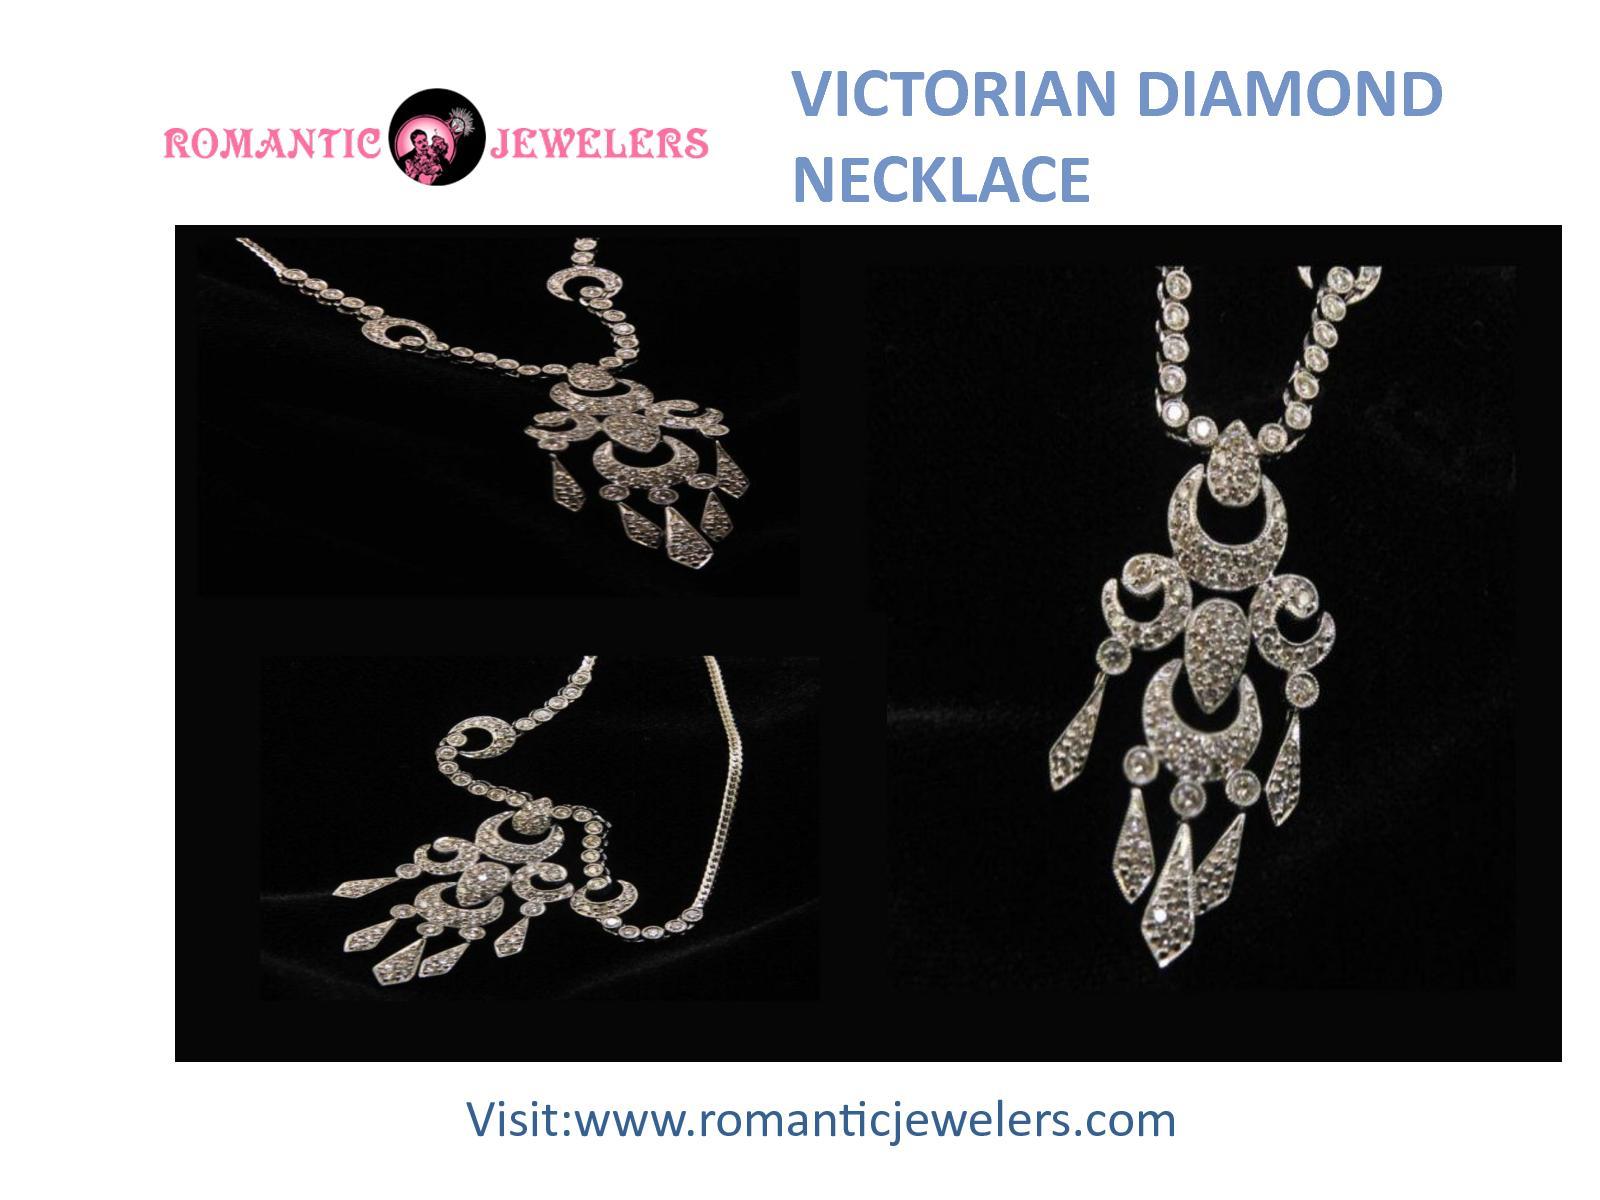 Extra Stunning Victorian Diamond Necklace